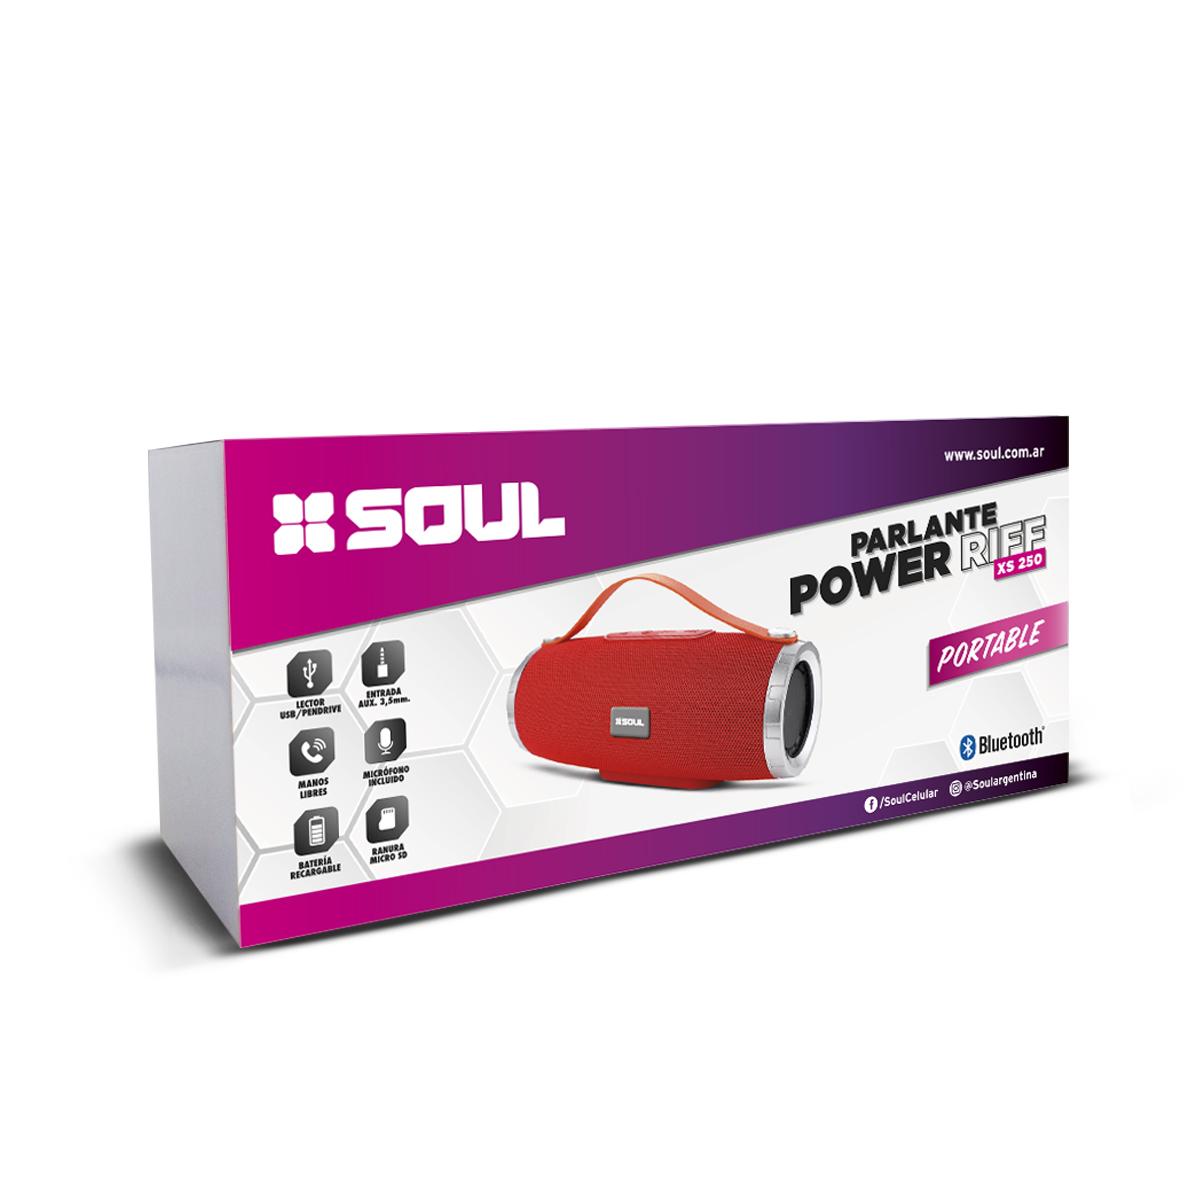 Parlante Power Riff XS250